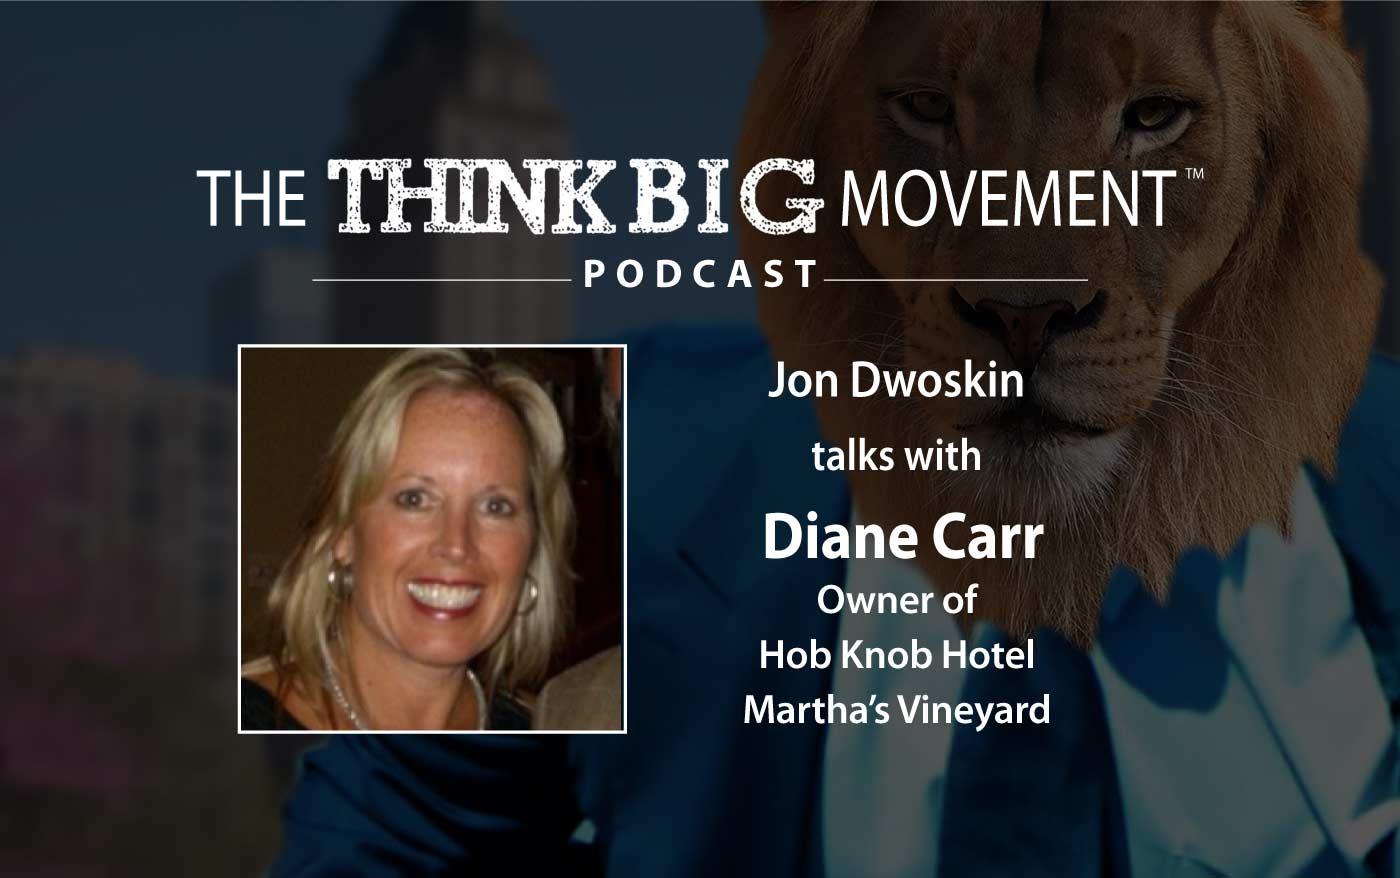 Think Big Movement Podcast - Jon Dwoskin Interviews Diane Carr, Owner of Hob Knob Hotel